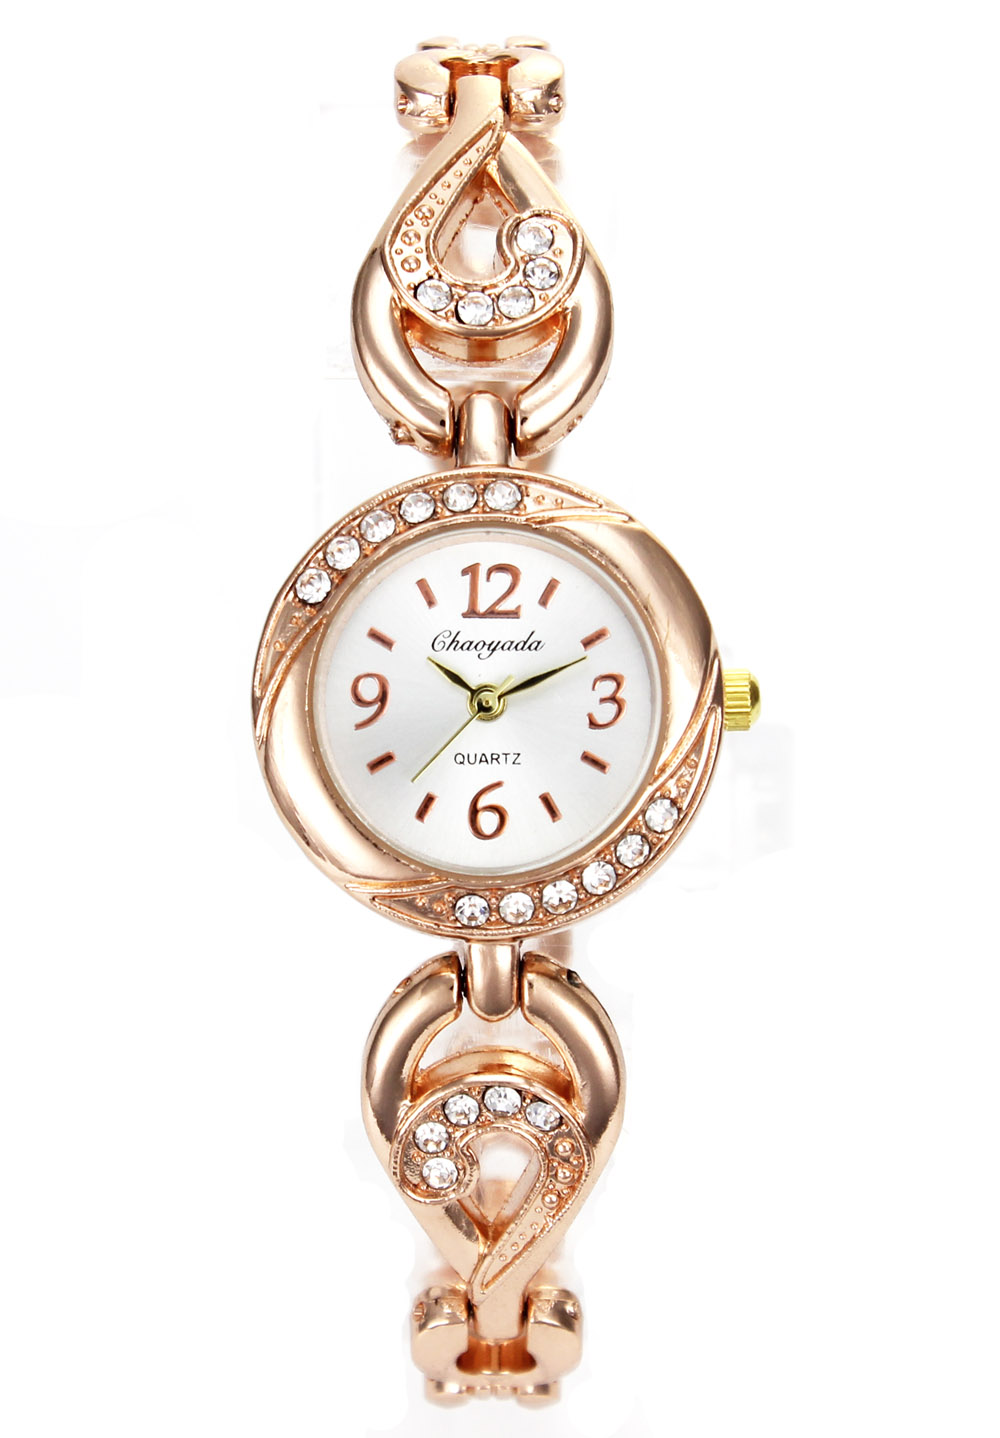 Women's Charm Rose Gold Female Bracelet Watch Fashion Ladies Crystal Chain Choker Necklace Wrist Watches цена и фото